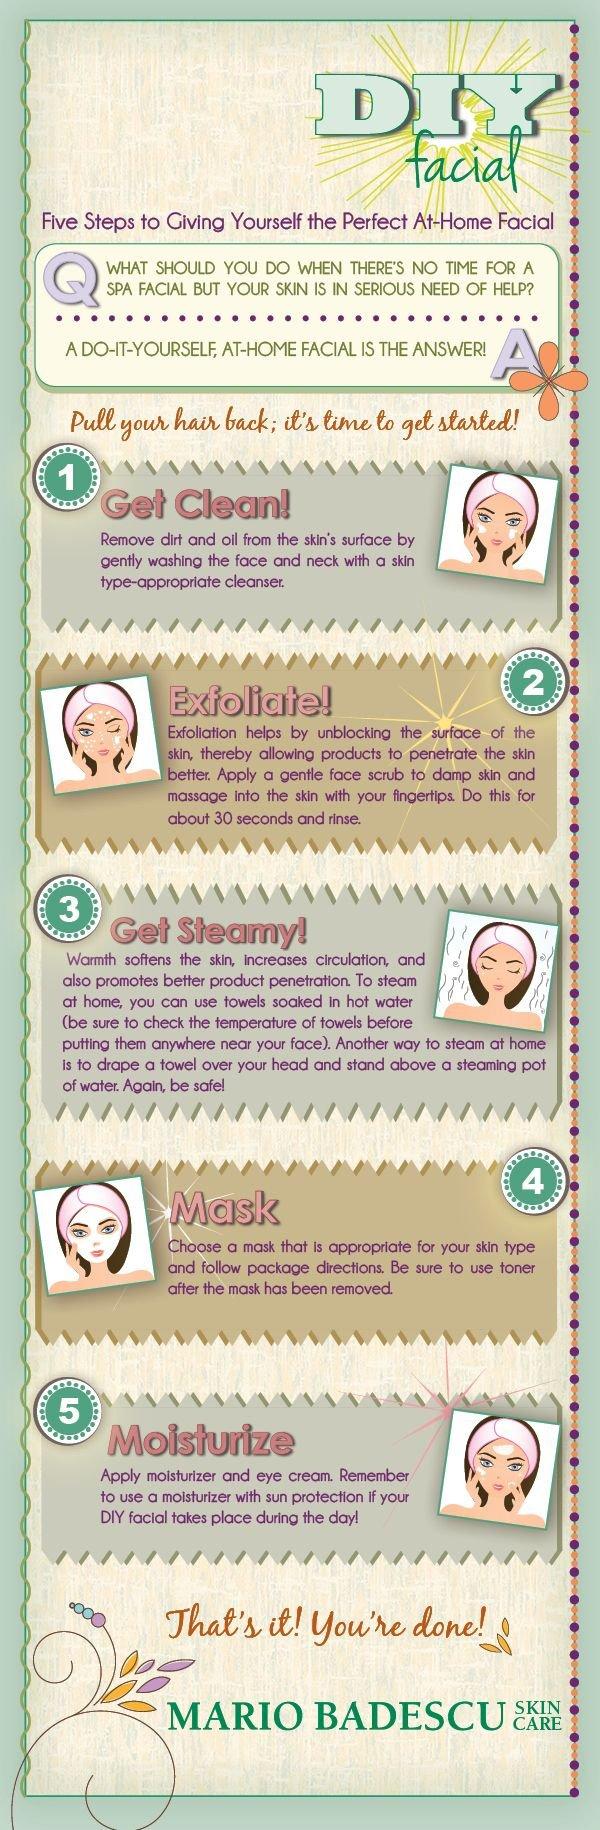 19 fabulous homemade steam facials for tired skin the diy facial process solutioingenieria Image collections